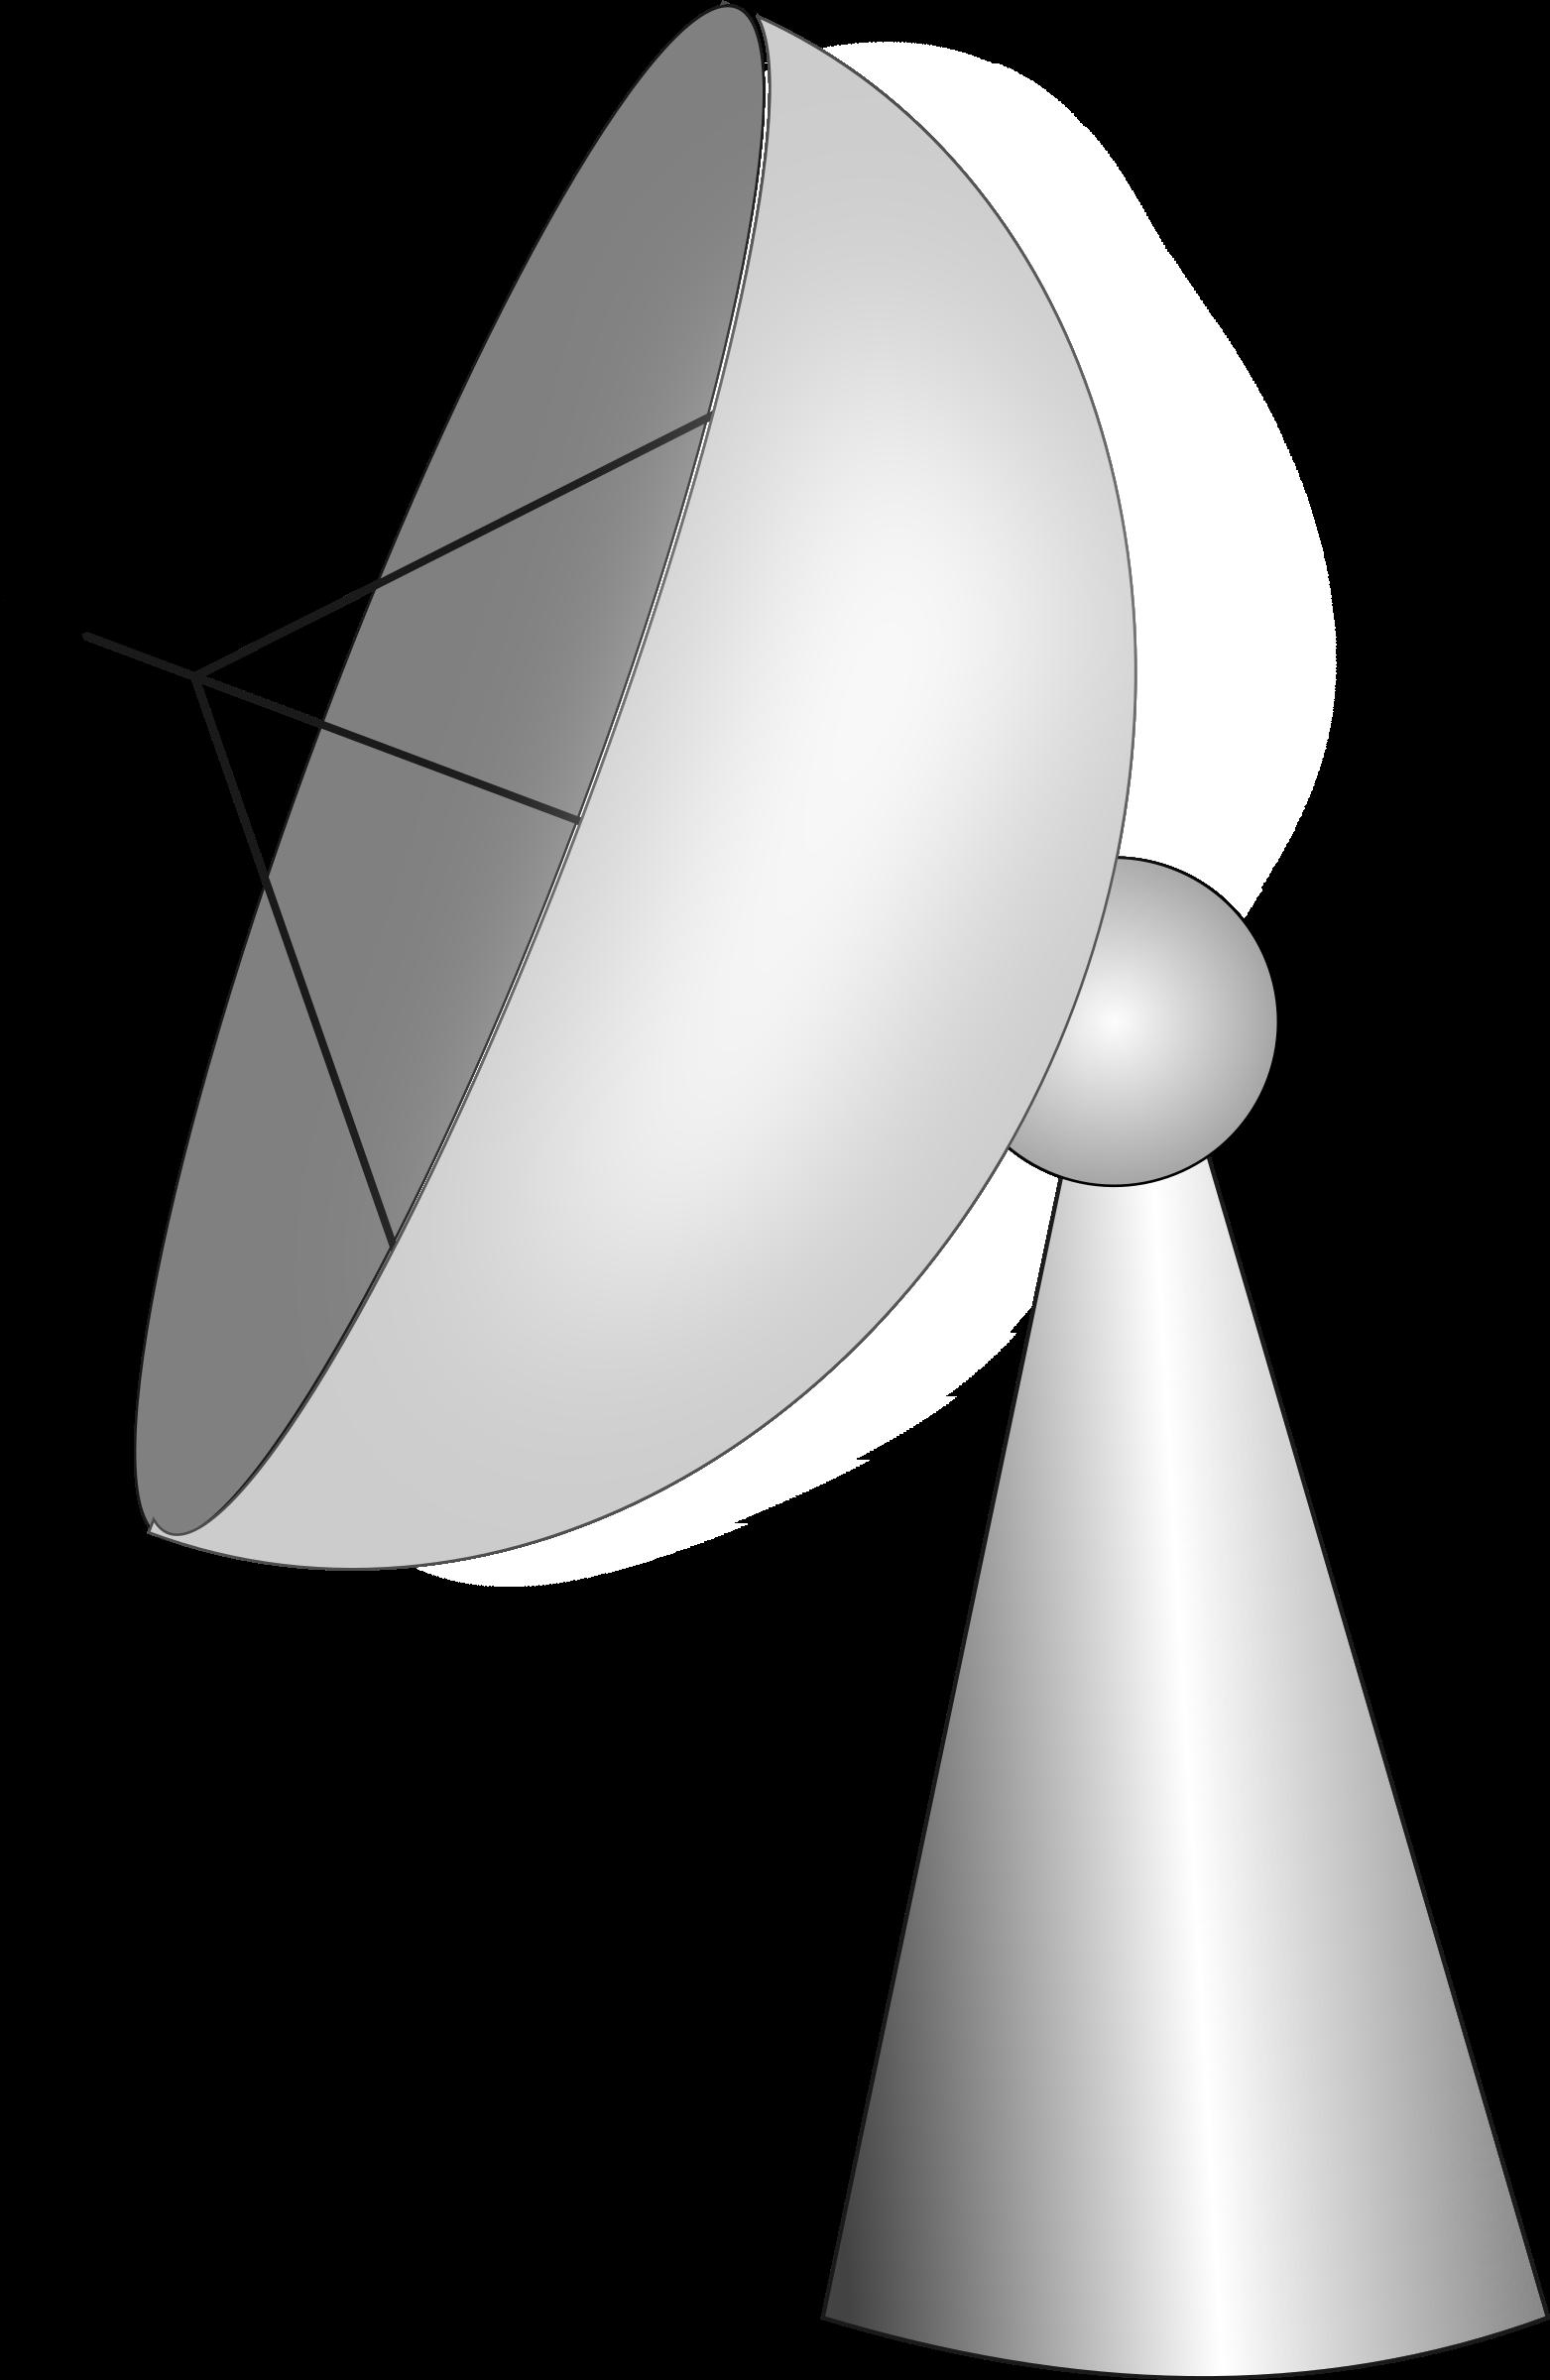 Satellite earth station. Communication clipart radio communication